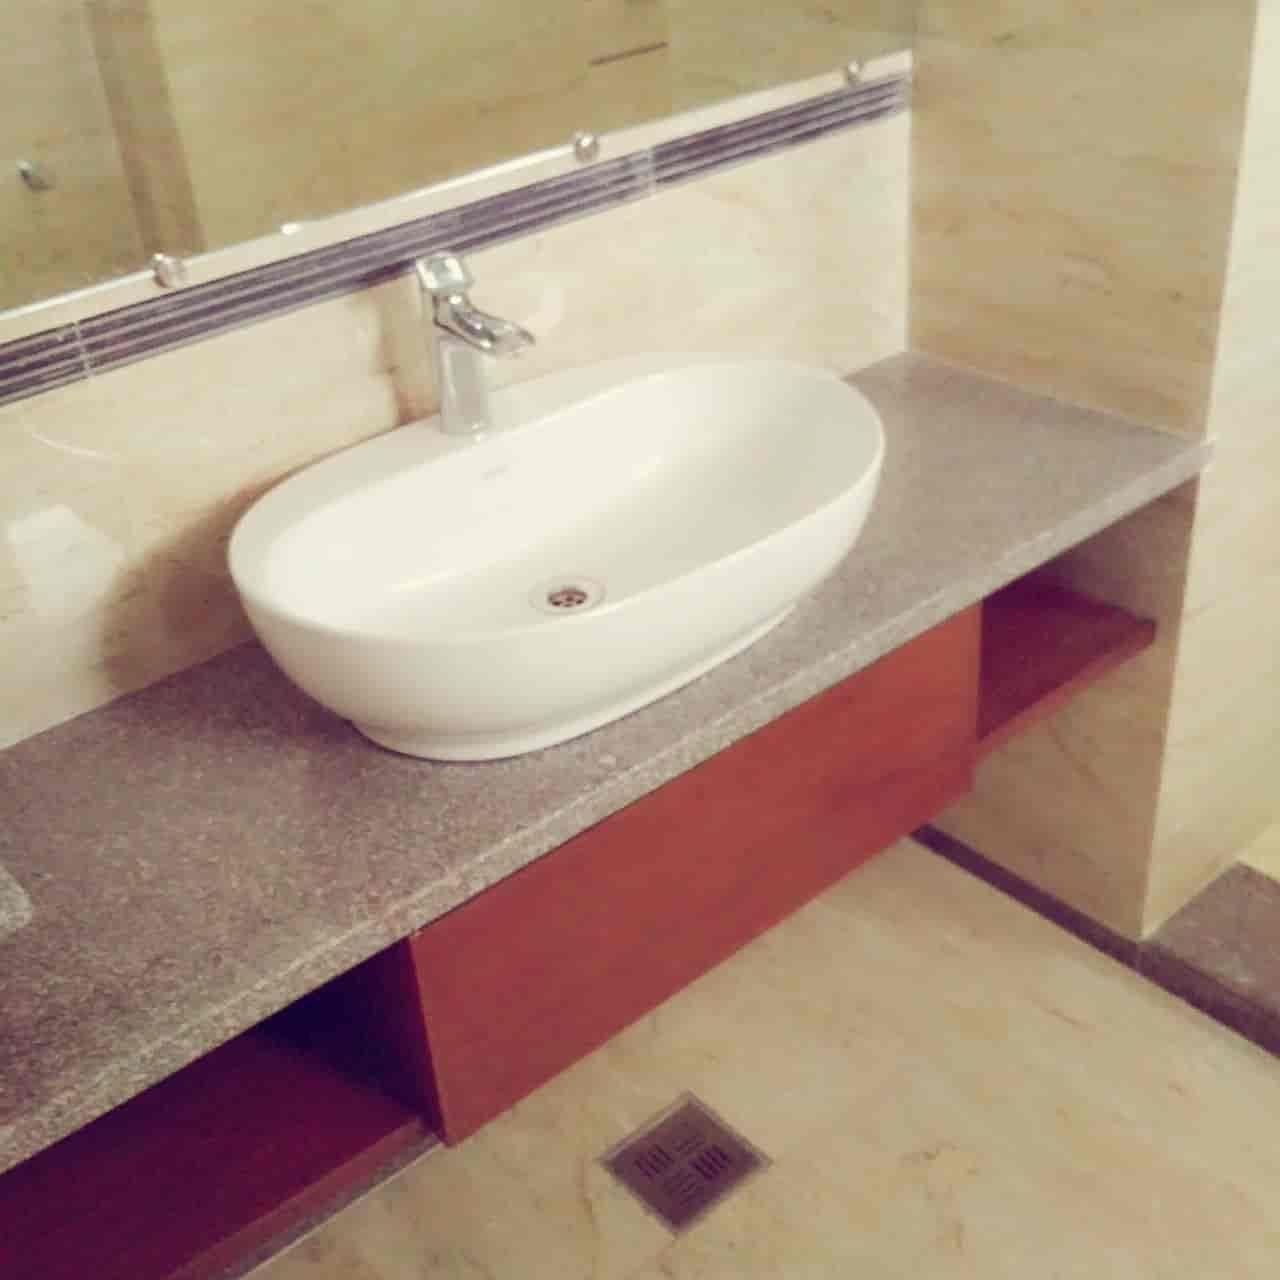 Durgaram Gujar Flooring And Fitting Contractors Photos Shivaji - Bathroom tile contractors